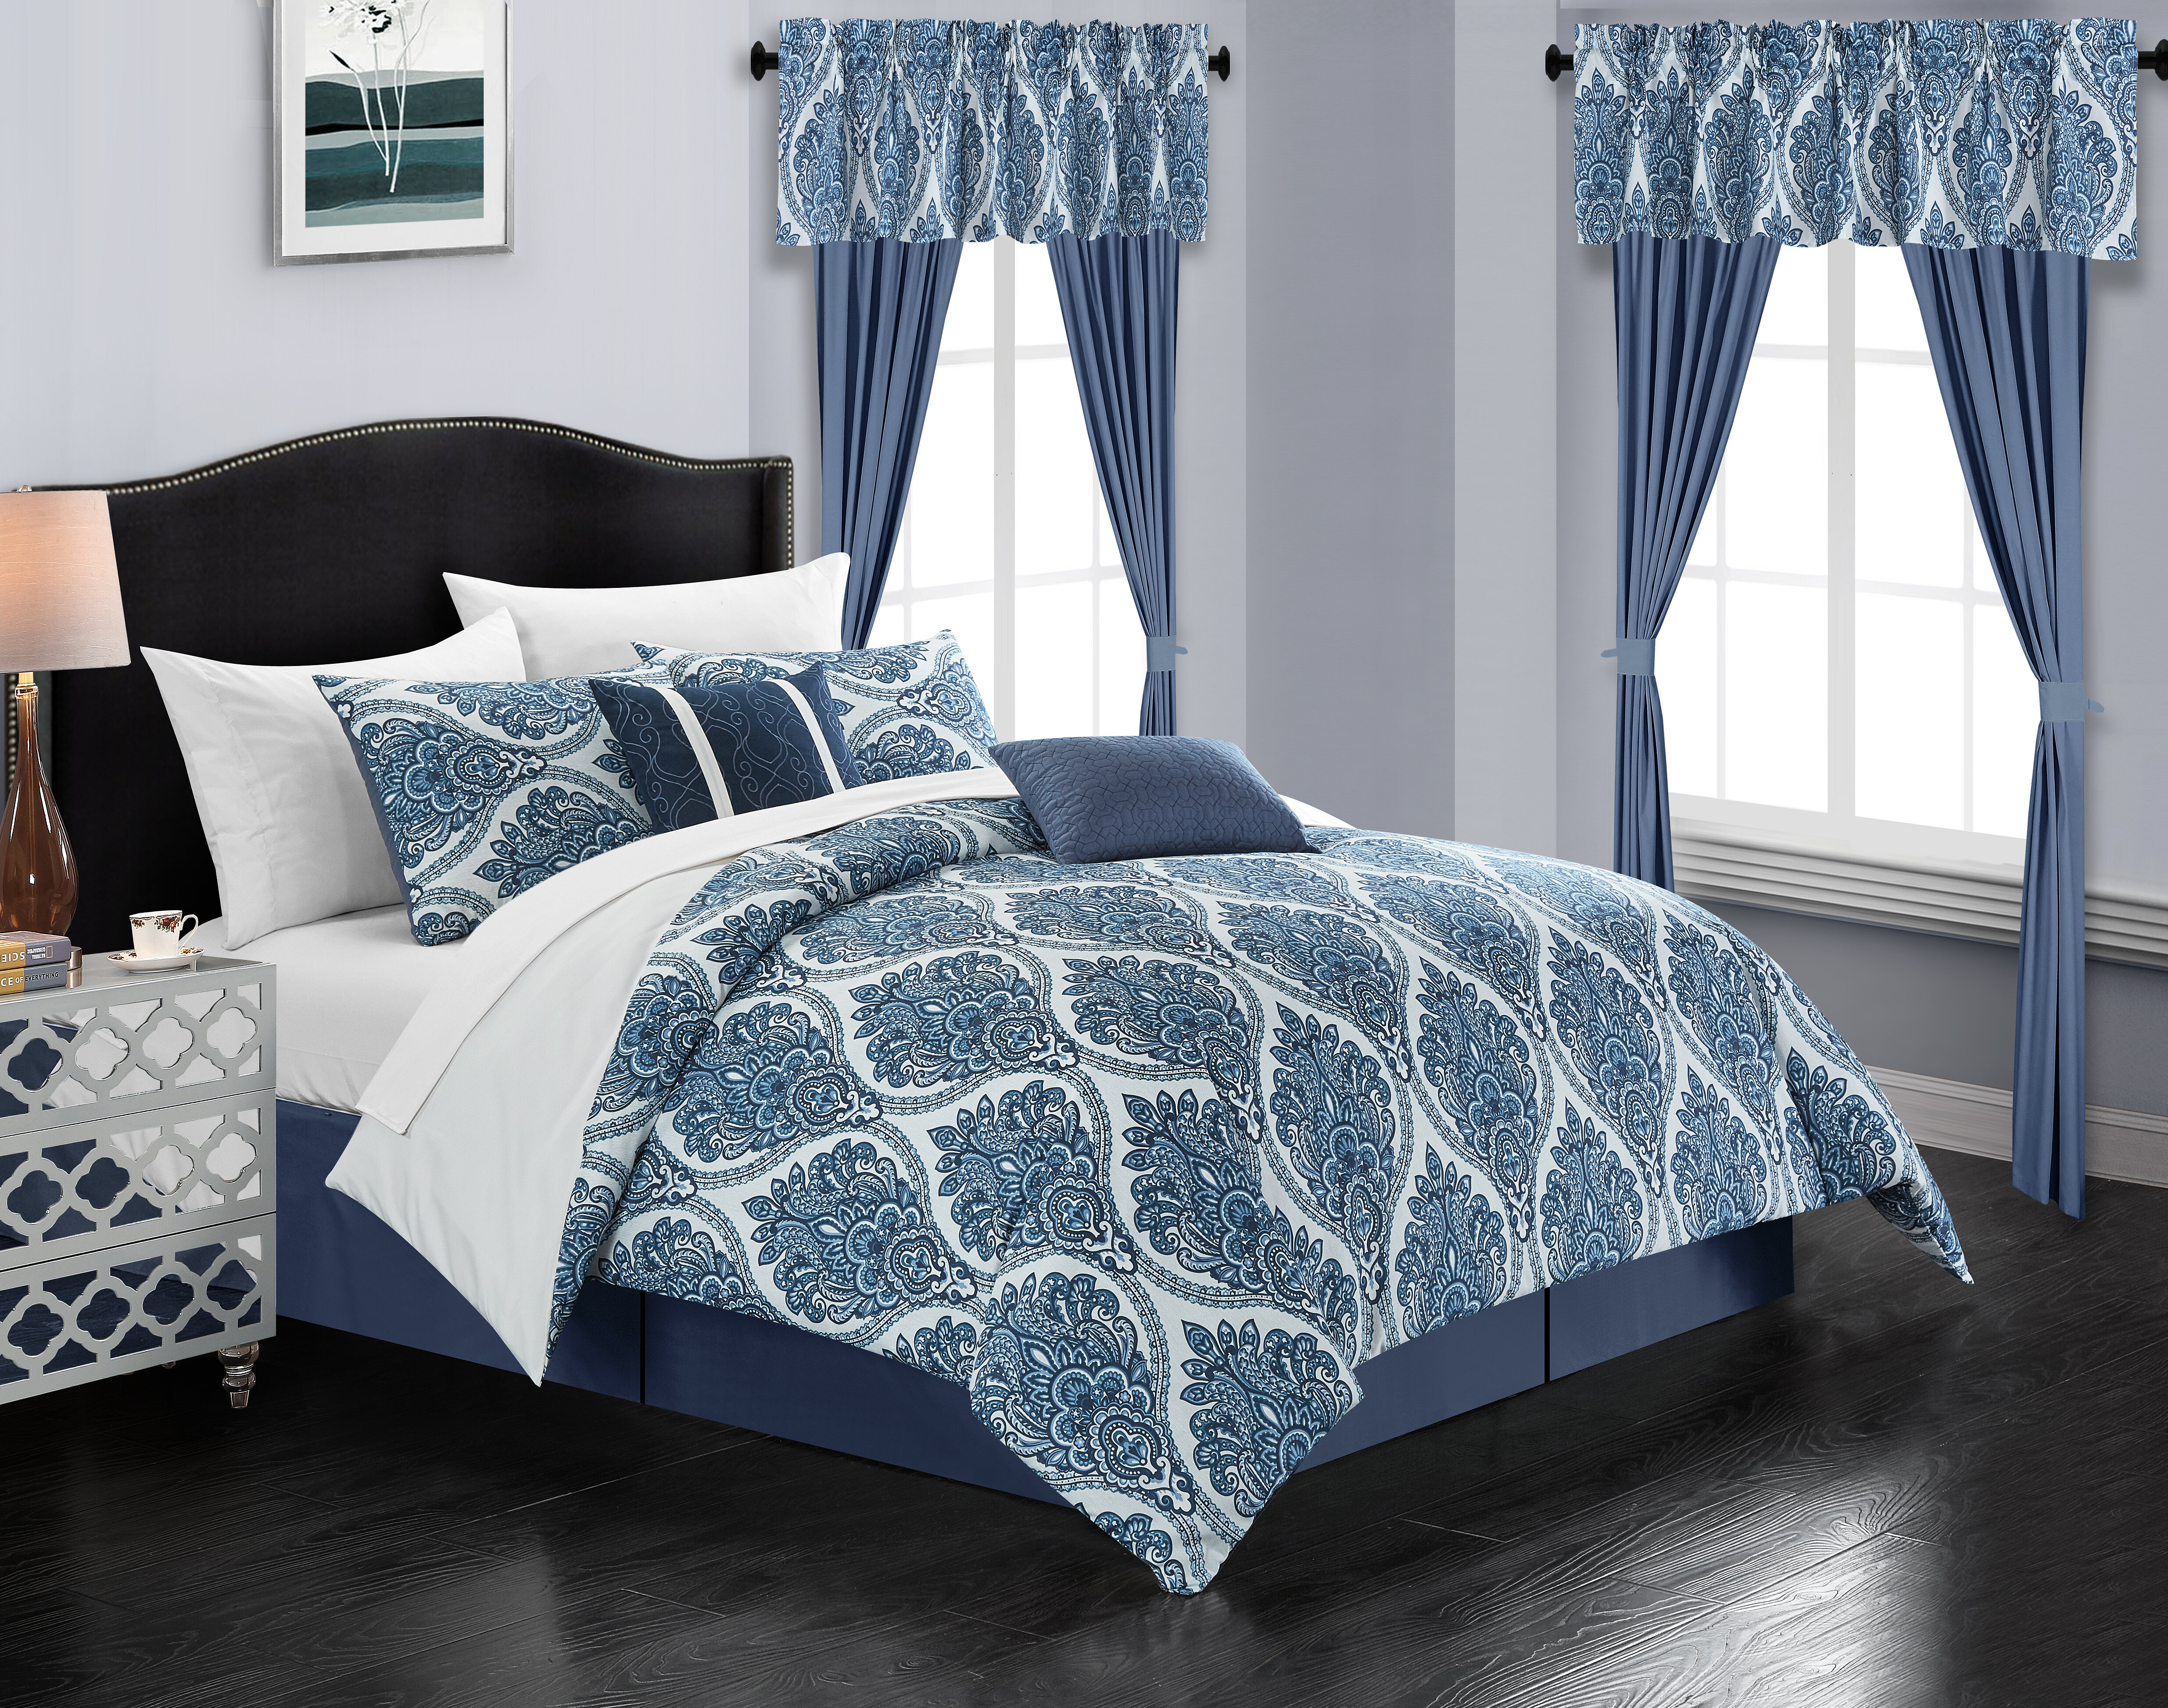 Alcott Hill Runkle 20 Piece Bed In A Bag Comforter Set Reviews Wayfair